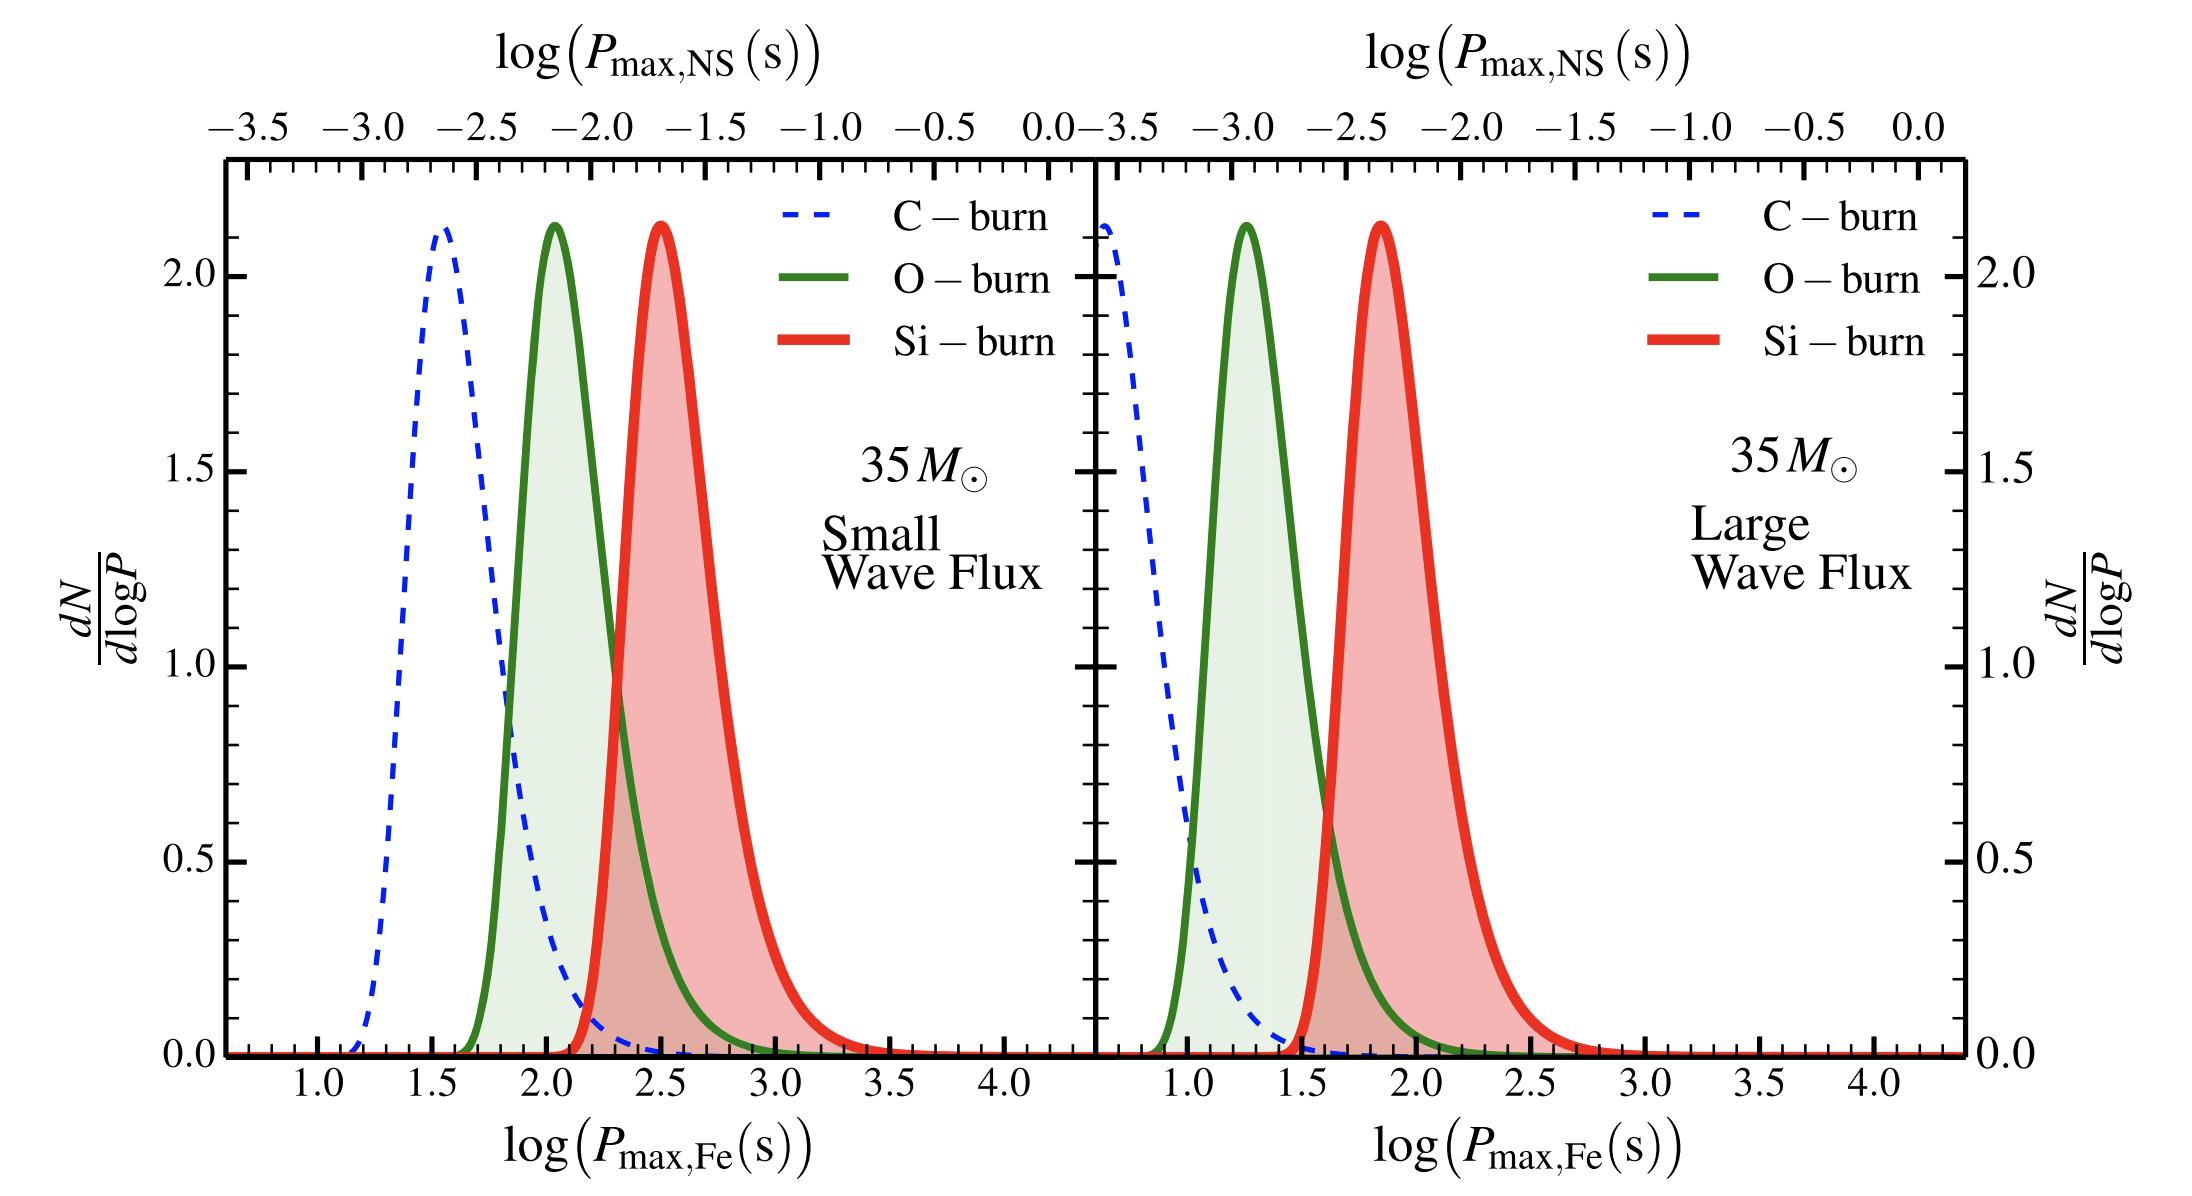 Wave-driven Angular Momentum Transport in Massive Stars